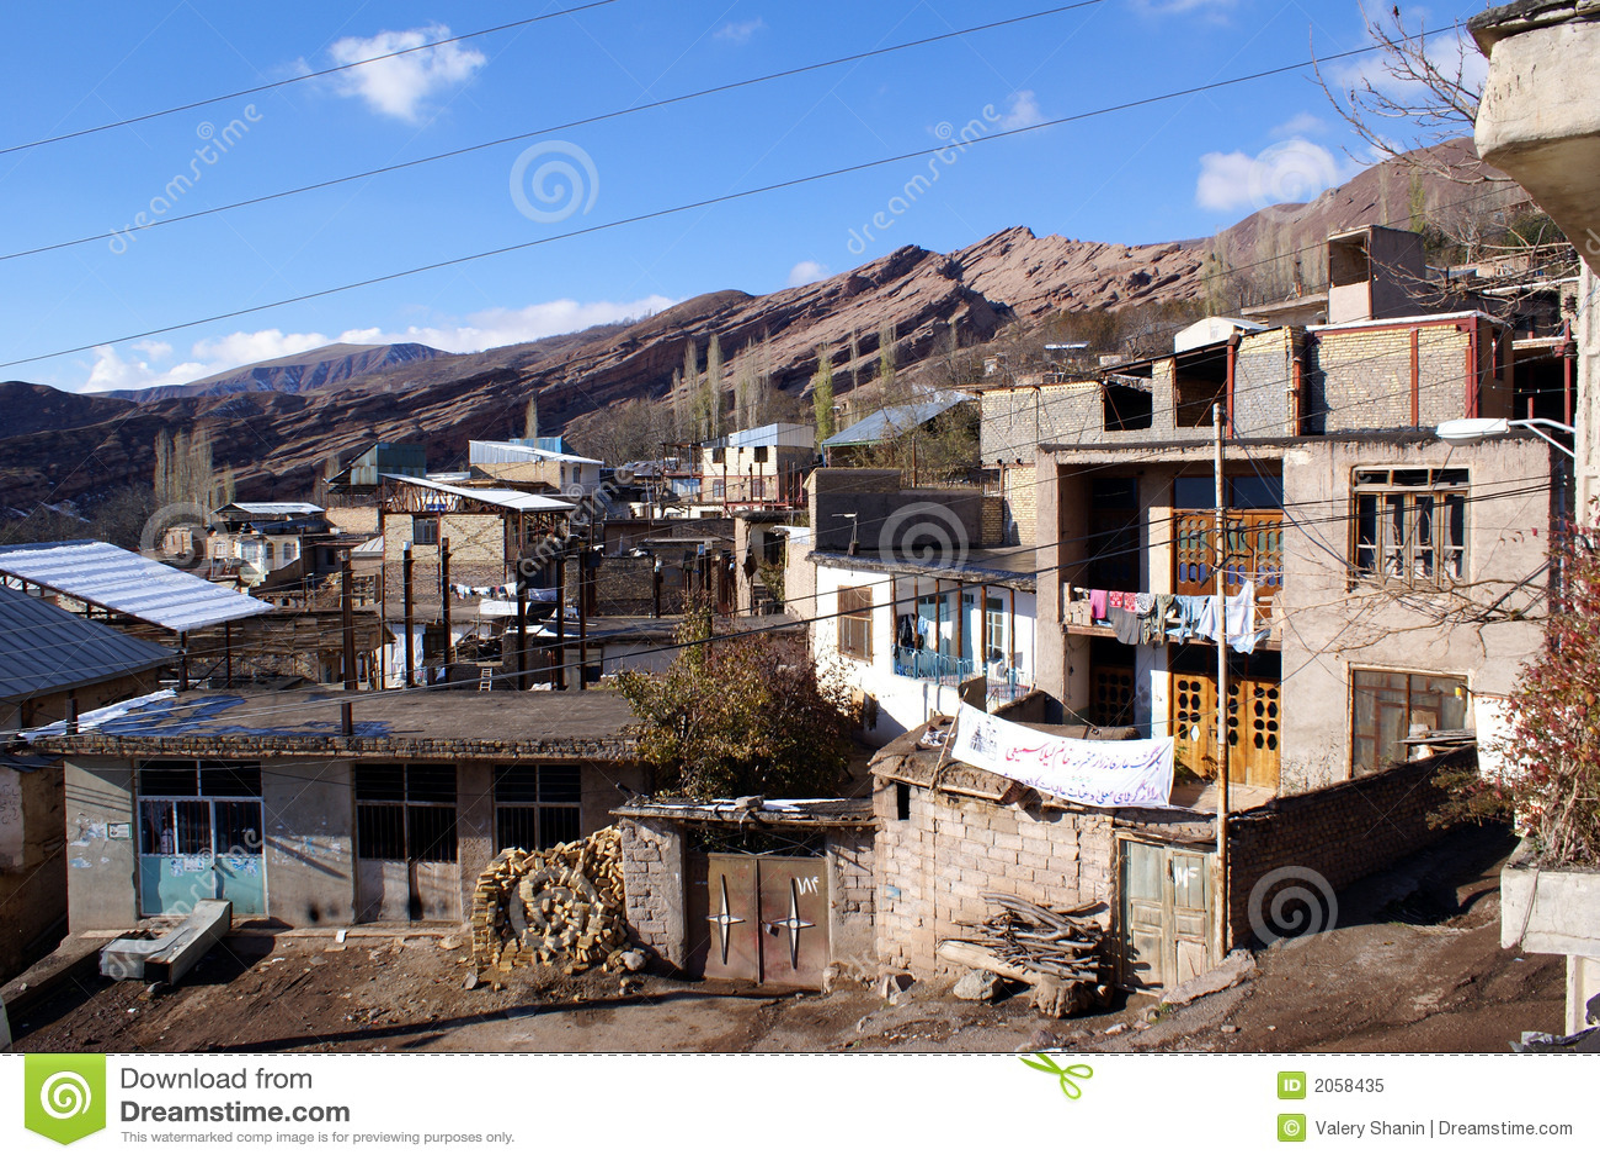 Mountain Village In Iran Royalty Free Stock Photo - Image: 2058435